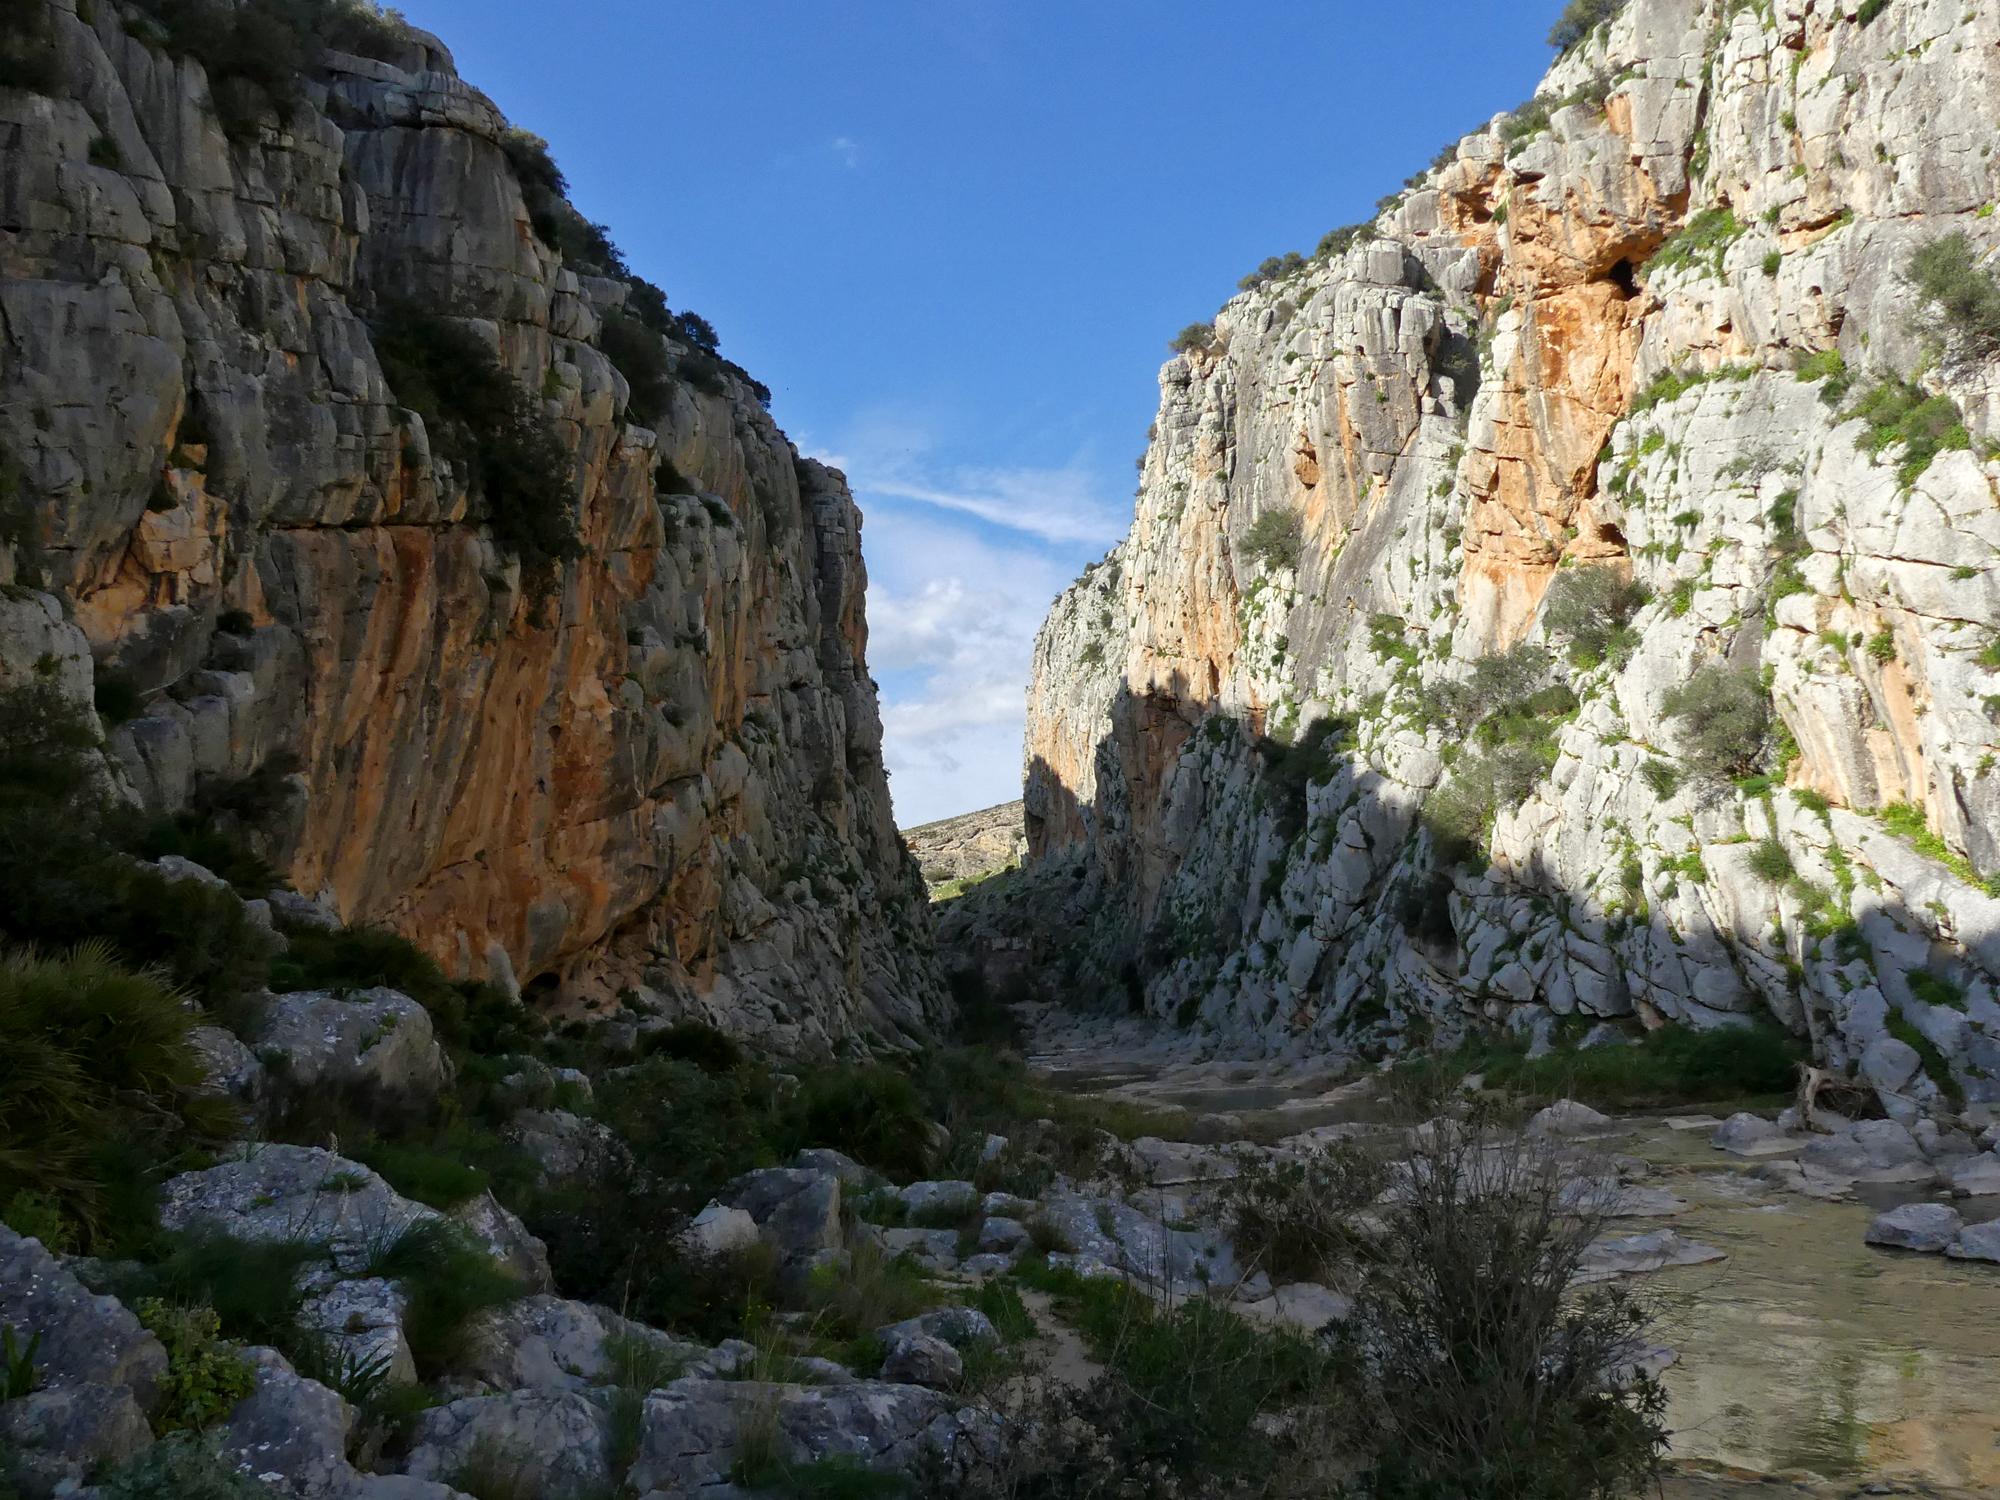 Teba Gorge